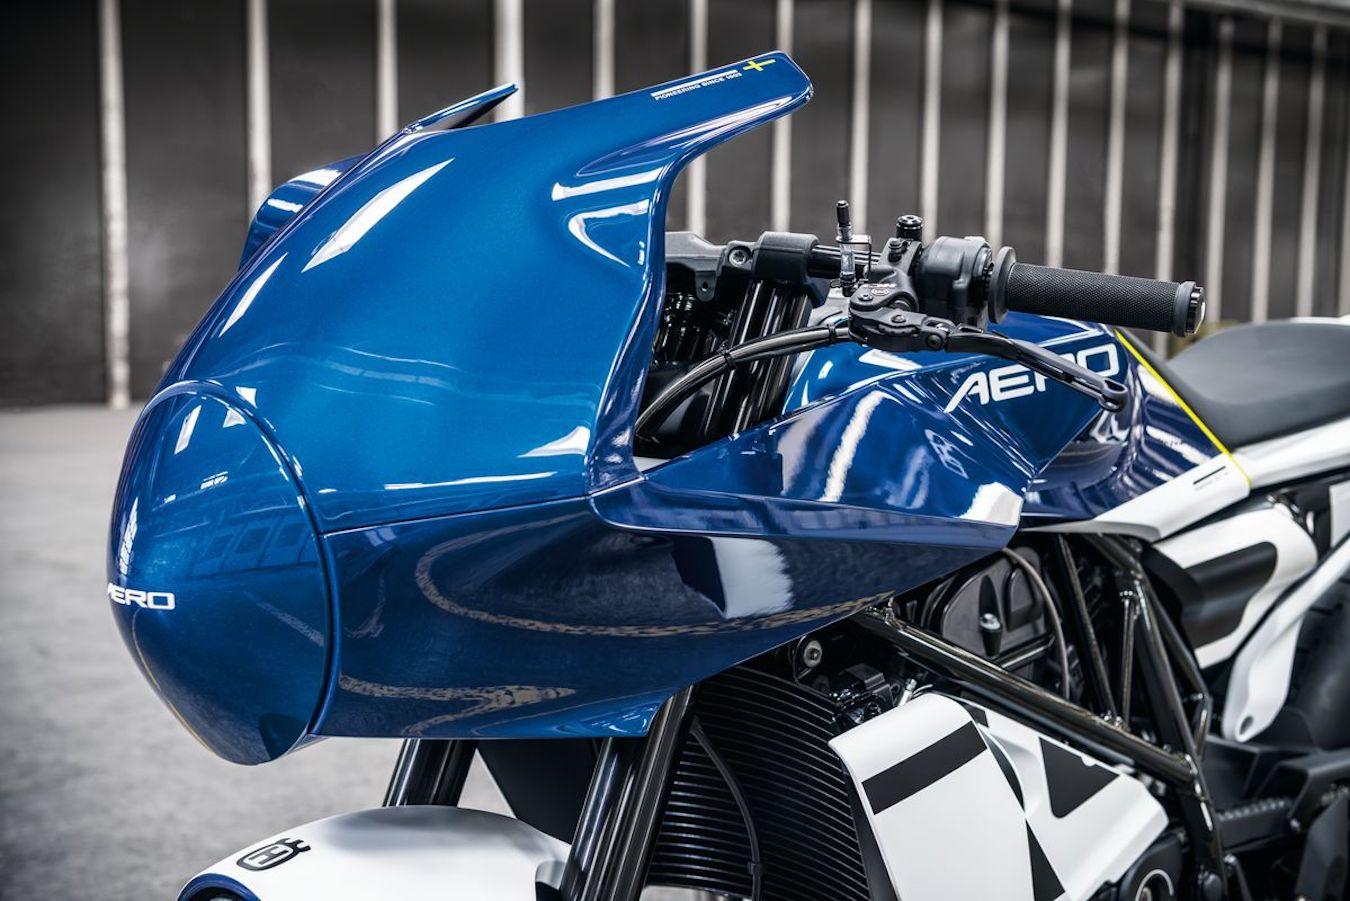 Close-up of front fairing - Vitpilen 701 Aero Concept